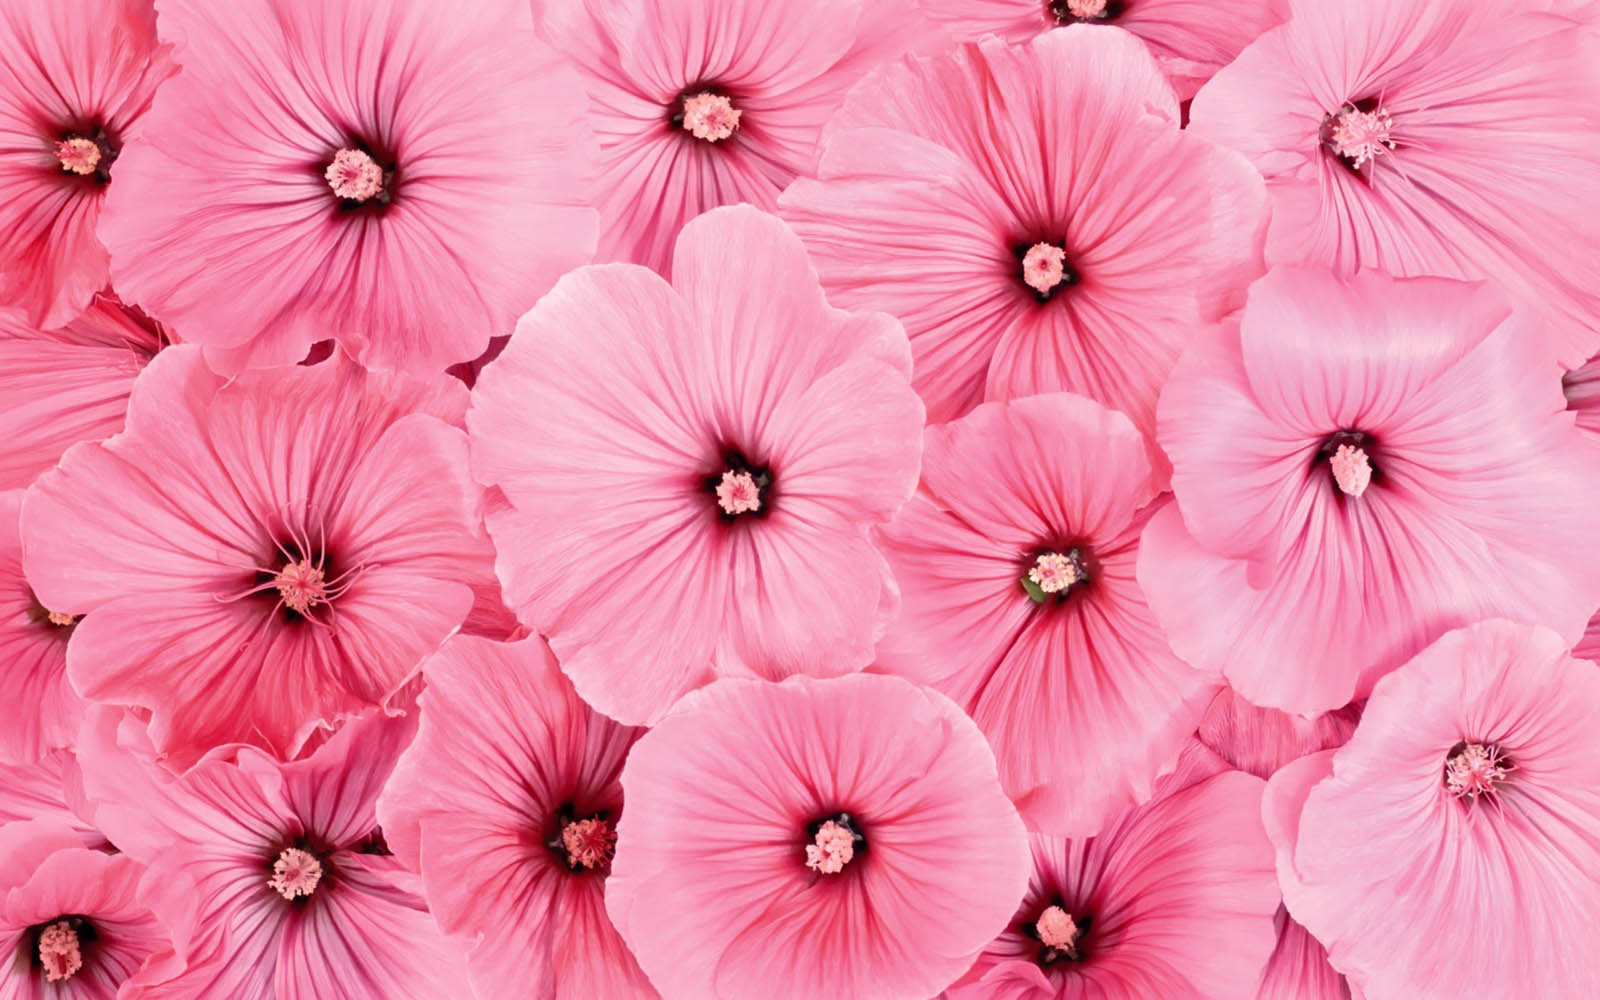 PinkFlowers Desktop Wallpapers Pink Flowers Desktop Backgrounds Pink 1600x1000